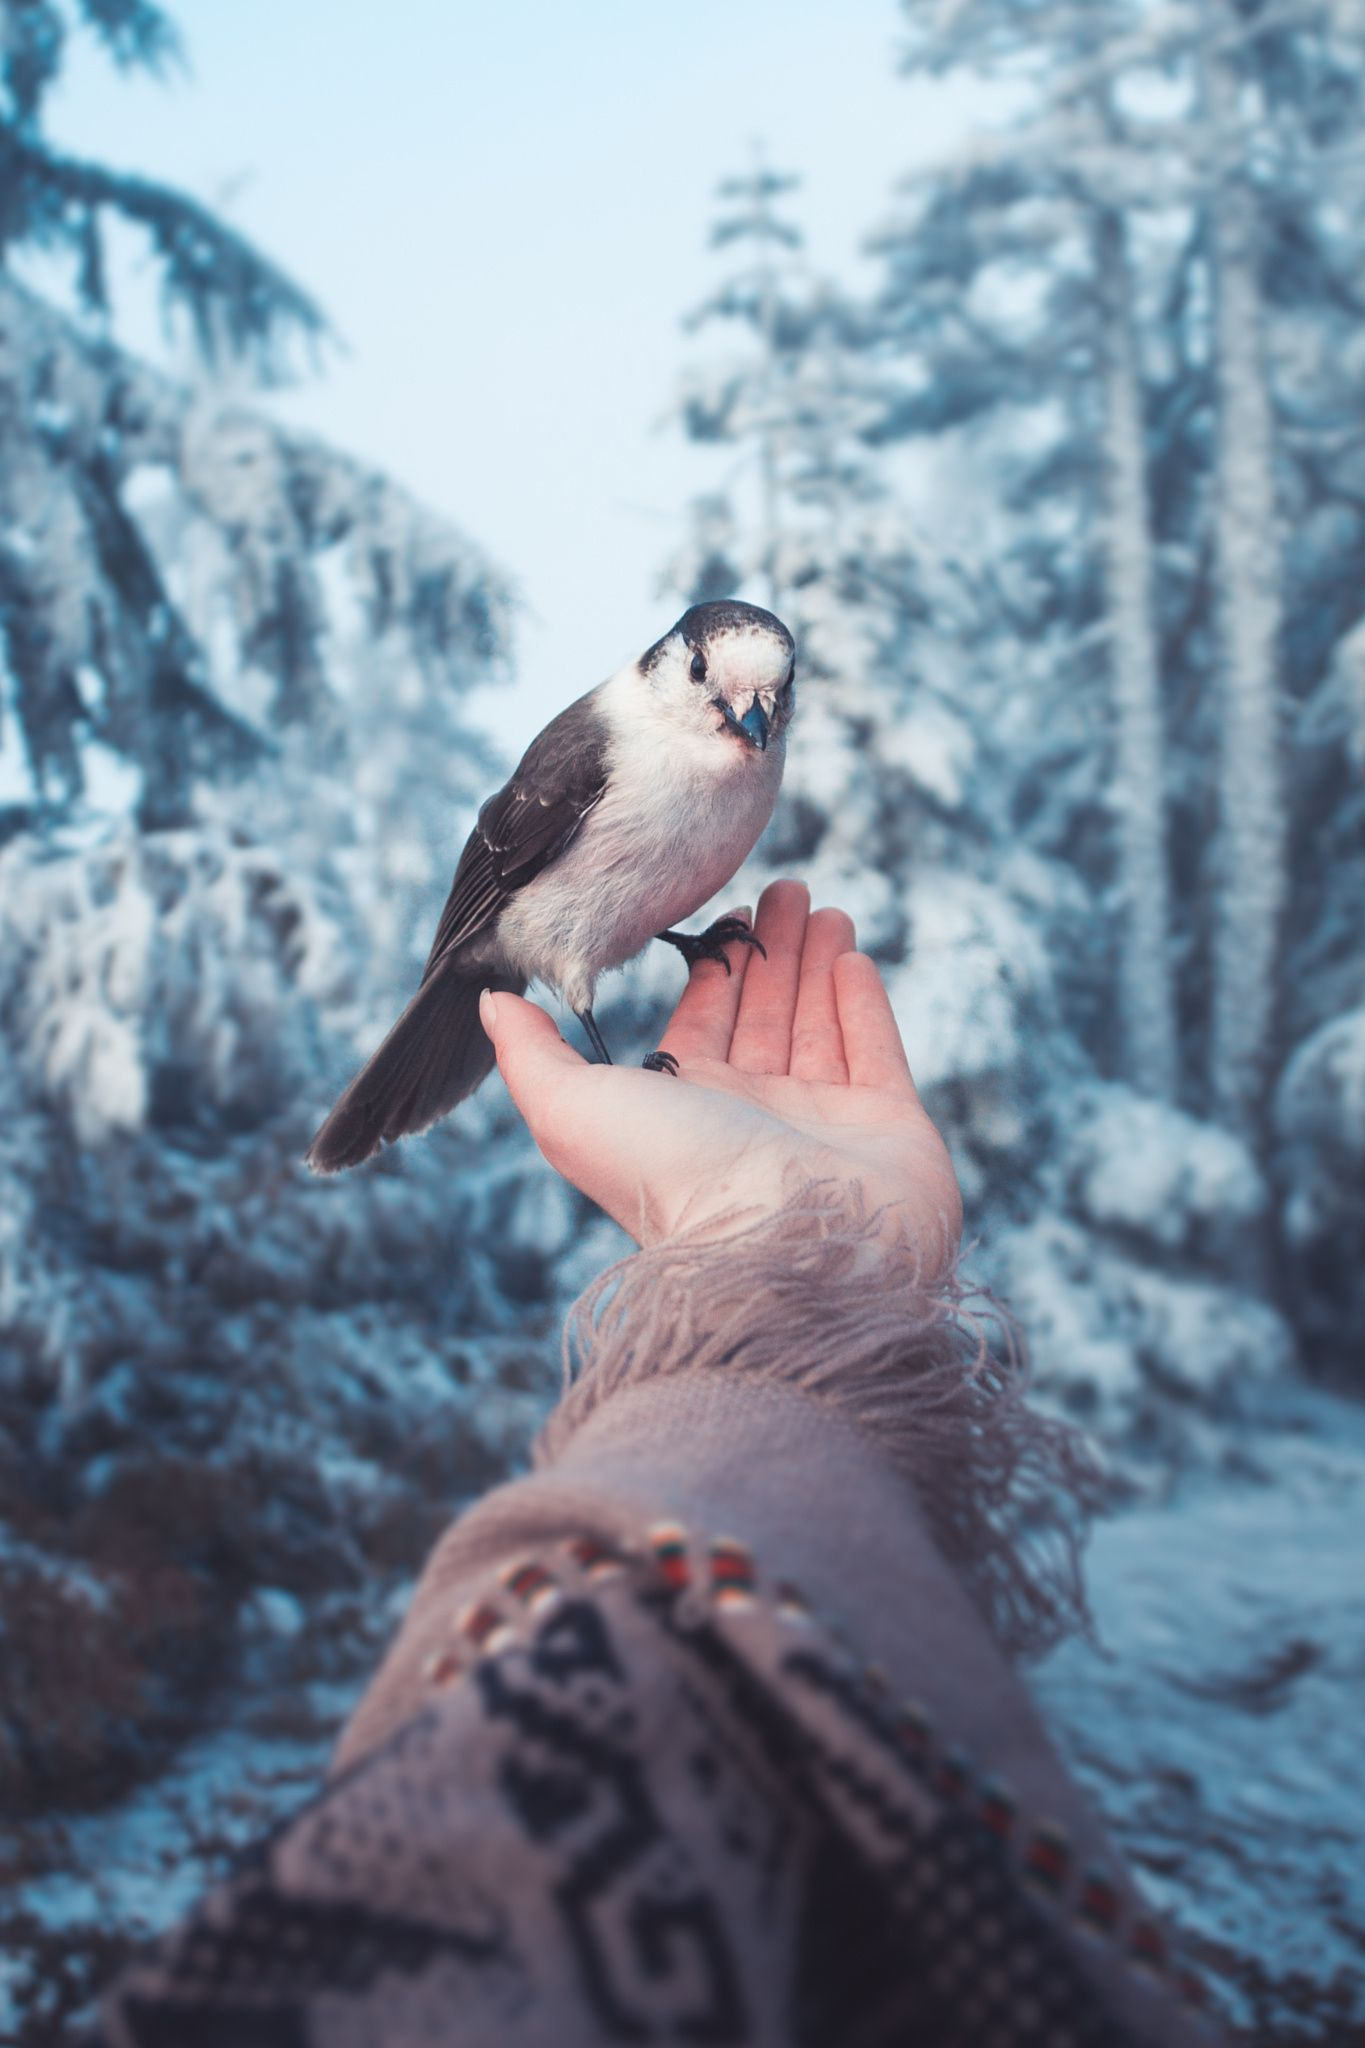 Sweet Little Soul By Lizzy Gadd Httpspxcomphoto - Awe inspiring landscape photography elizabeth gadd